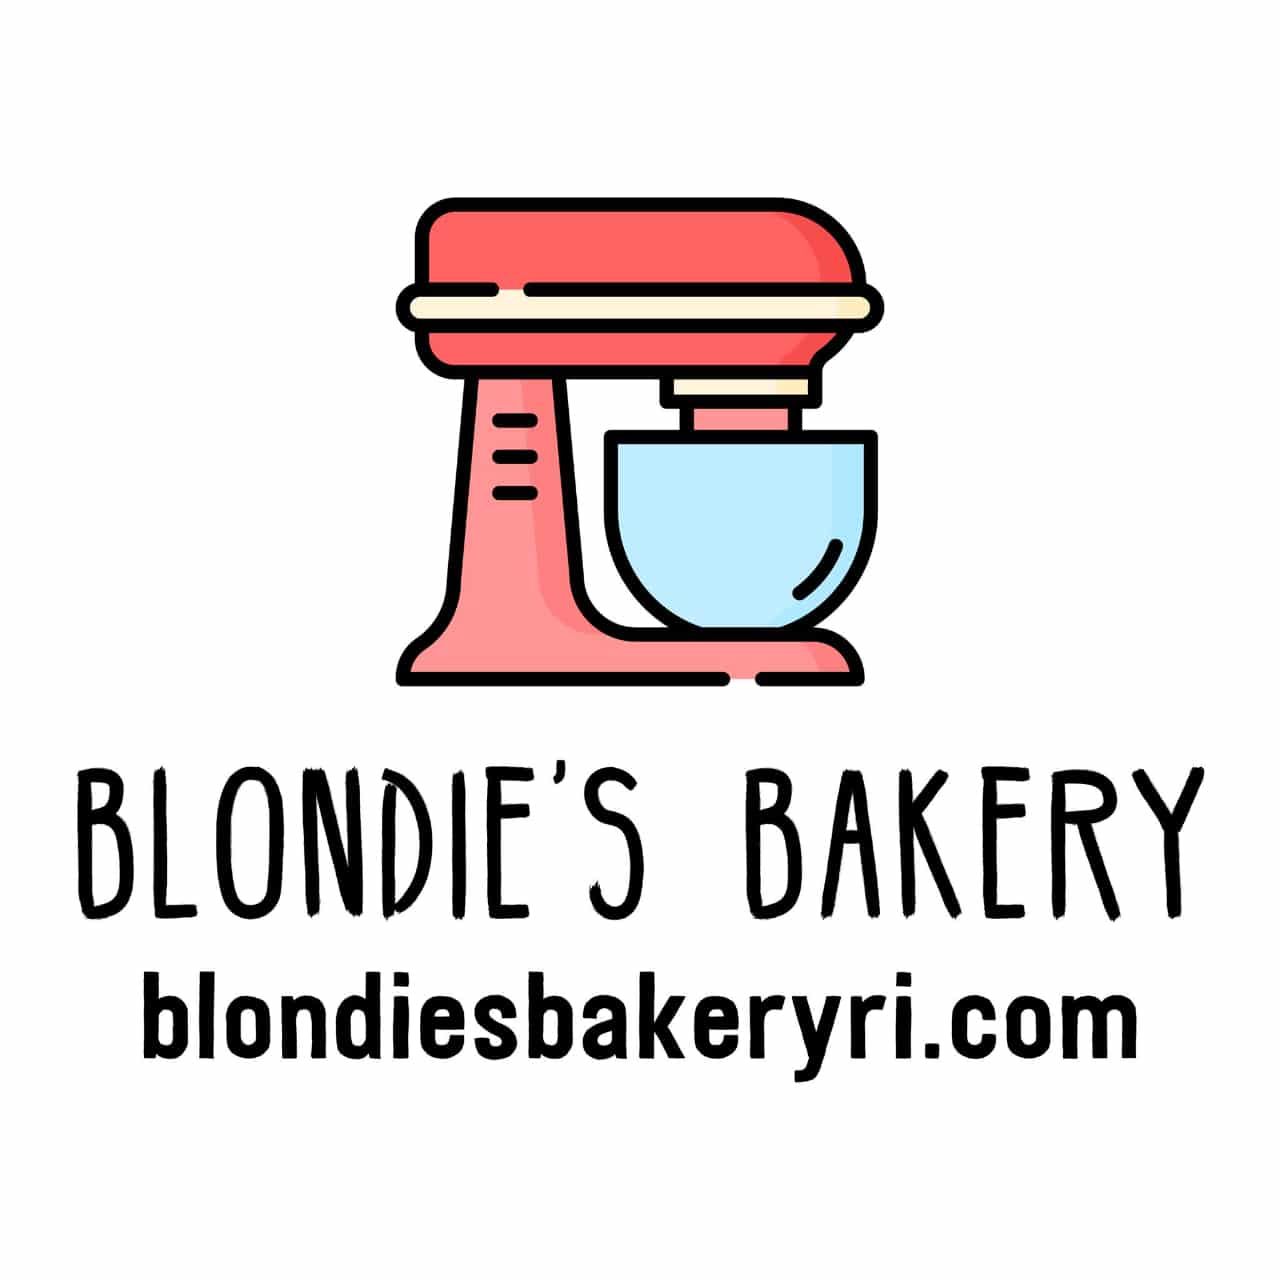 blondies_bakery_-_logo_square